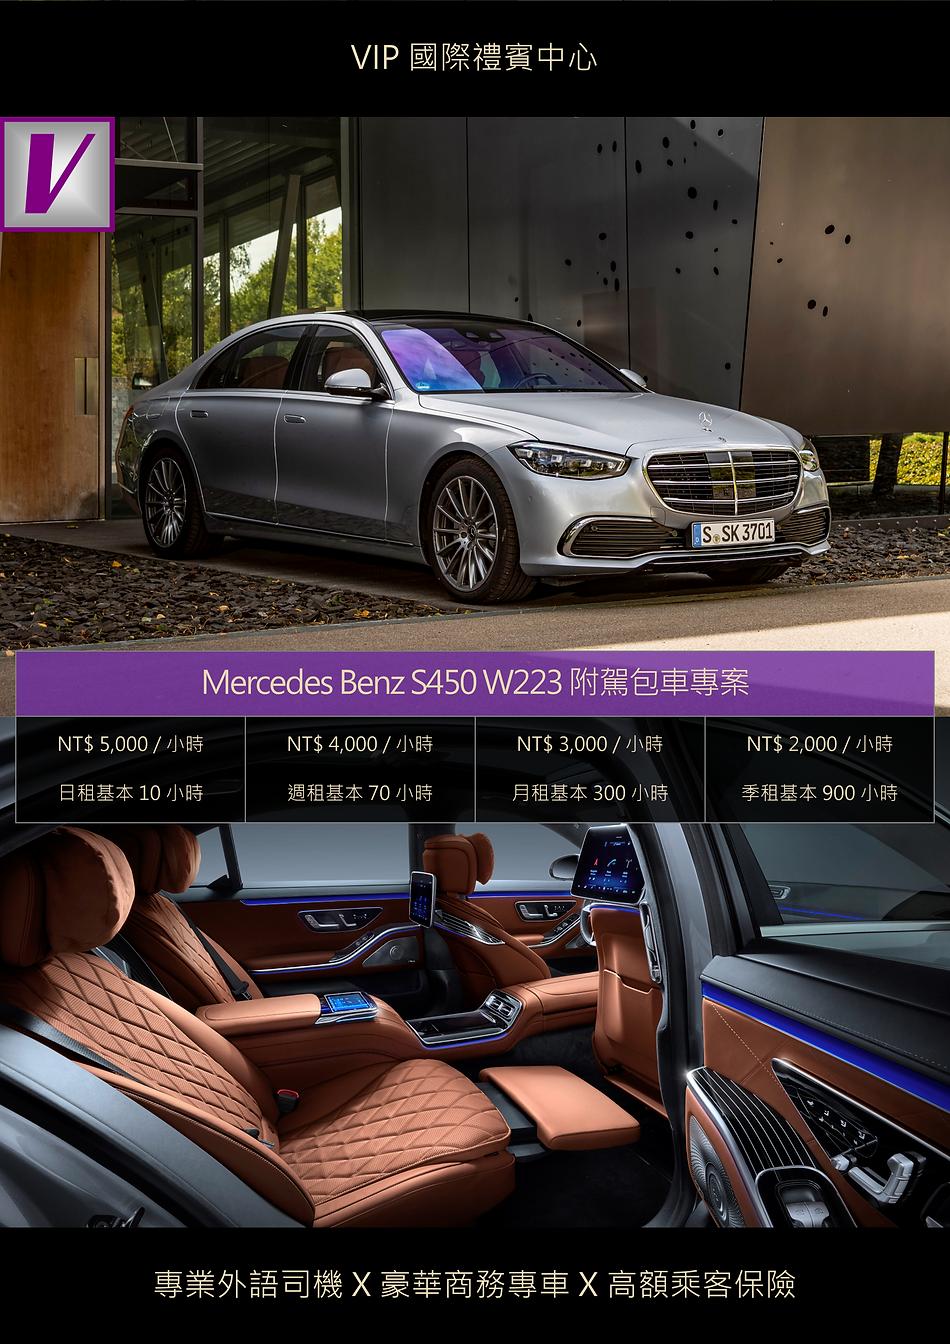 VIP國際禮賓中心 MERCEDES BENZ S450 W223 附駕包車專案 DM.png